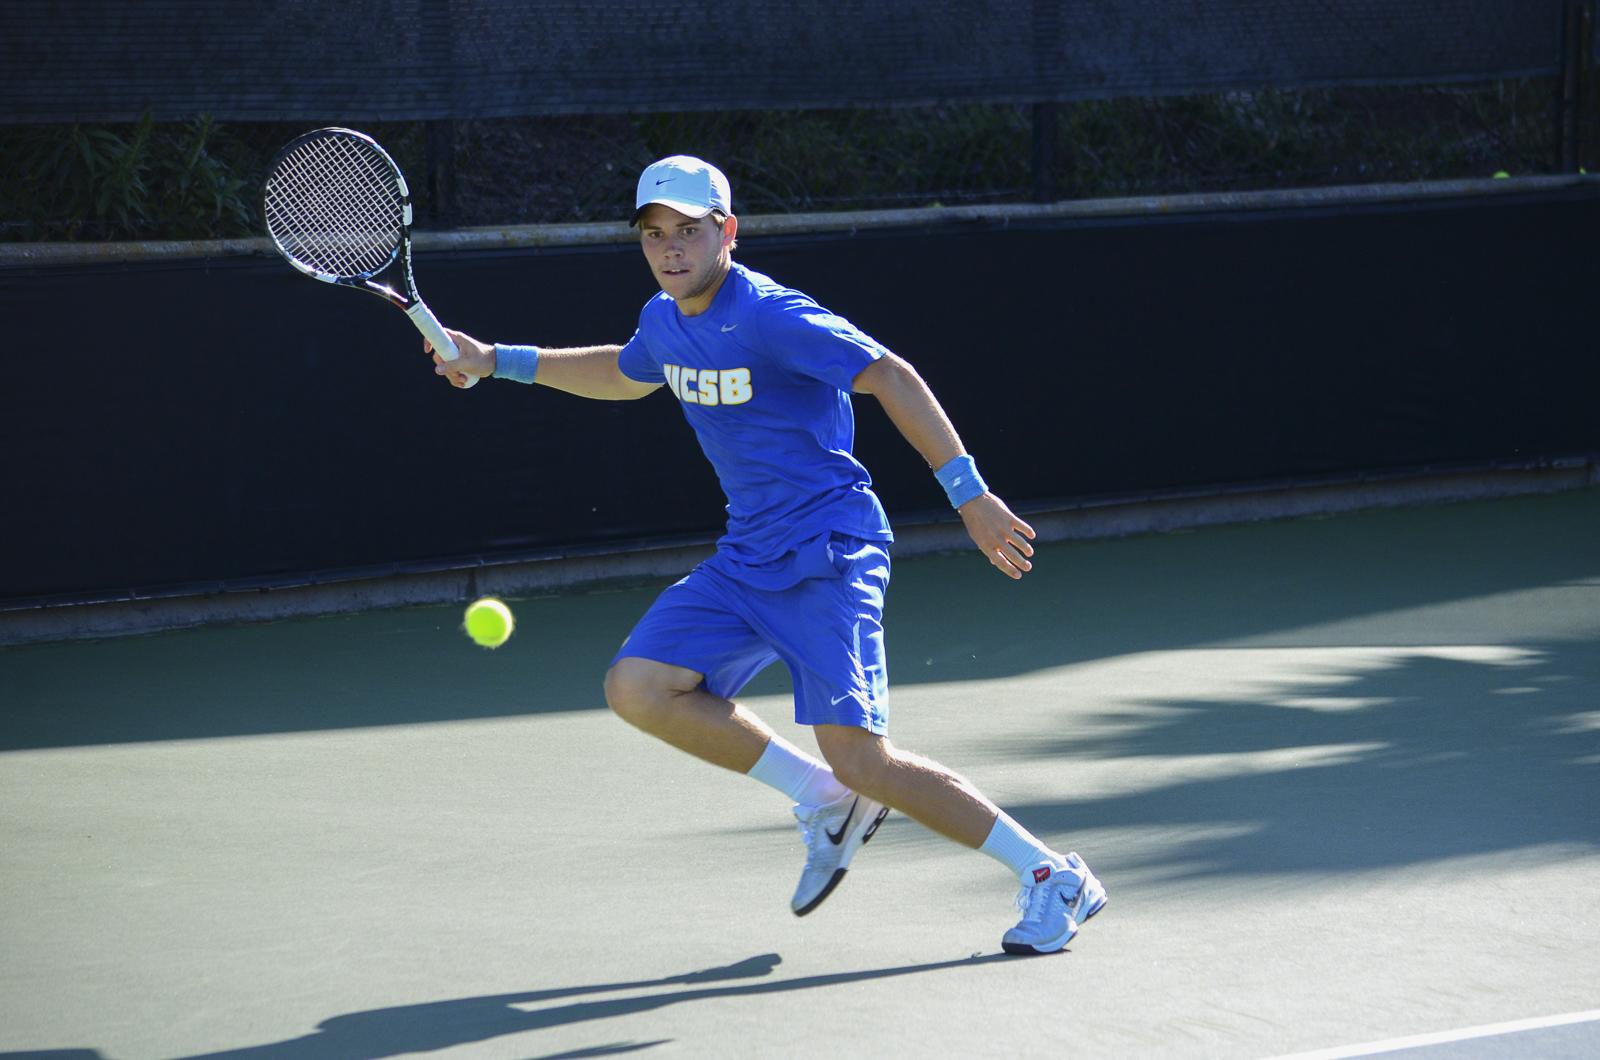 Tobias Galskov runs to hit the ball to his opponent. Christina DeMarzo/Daily Nexus